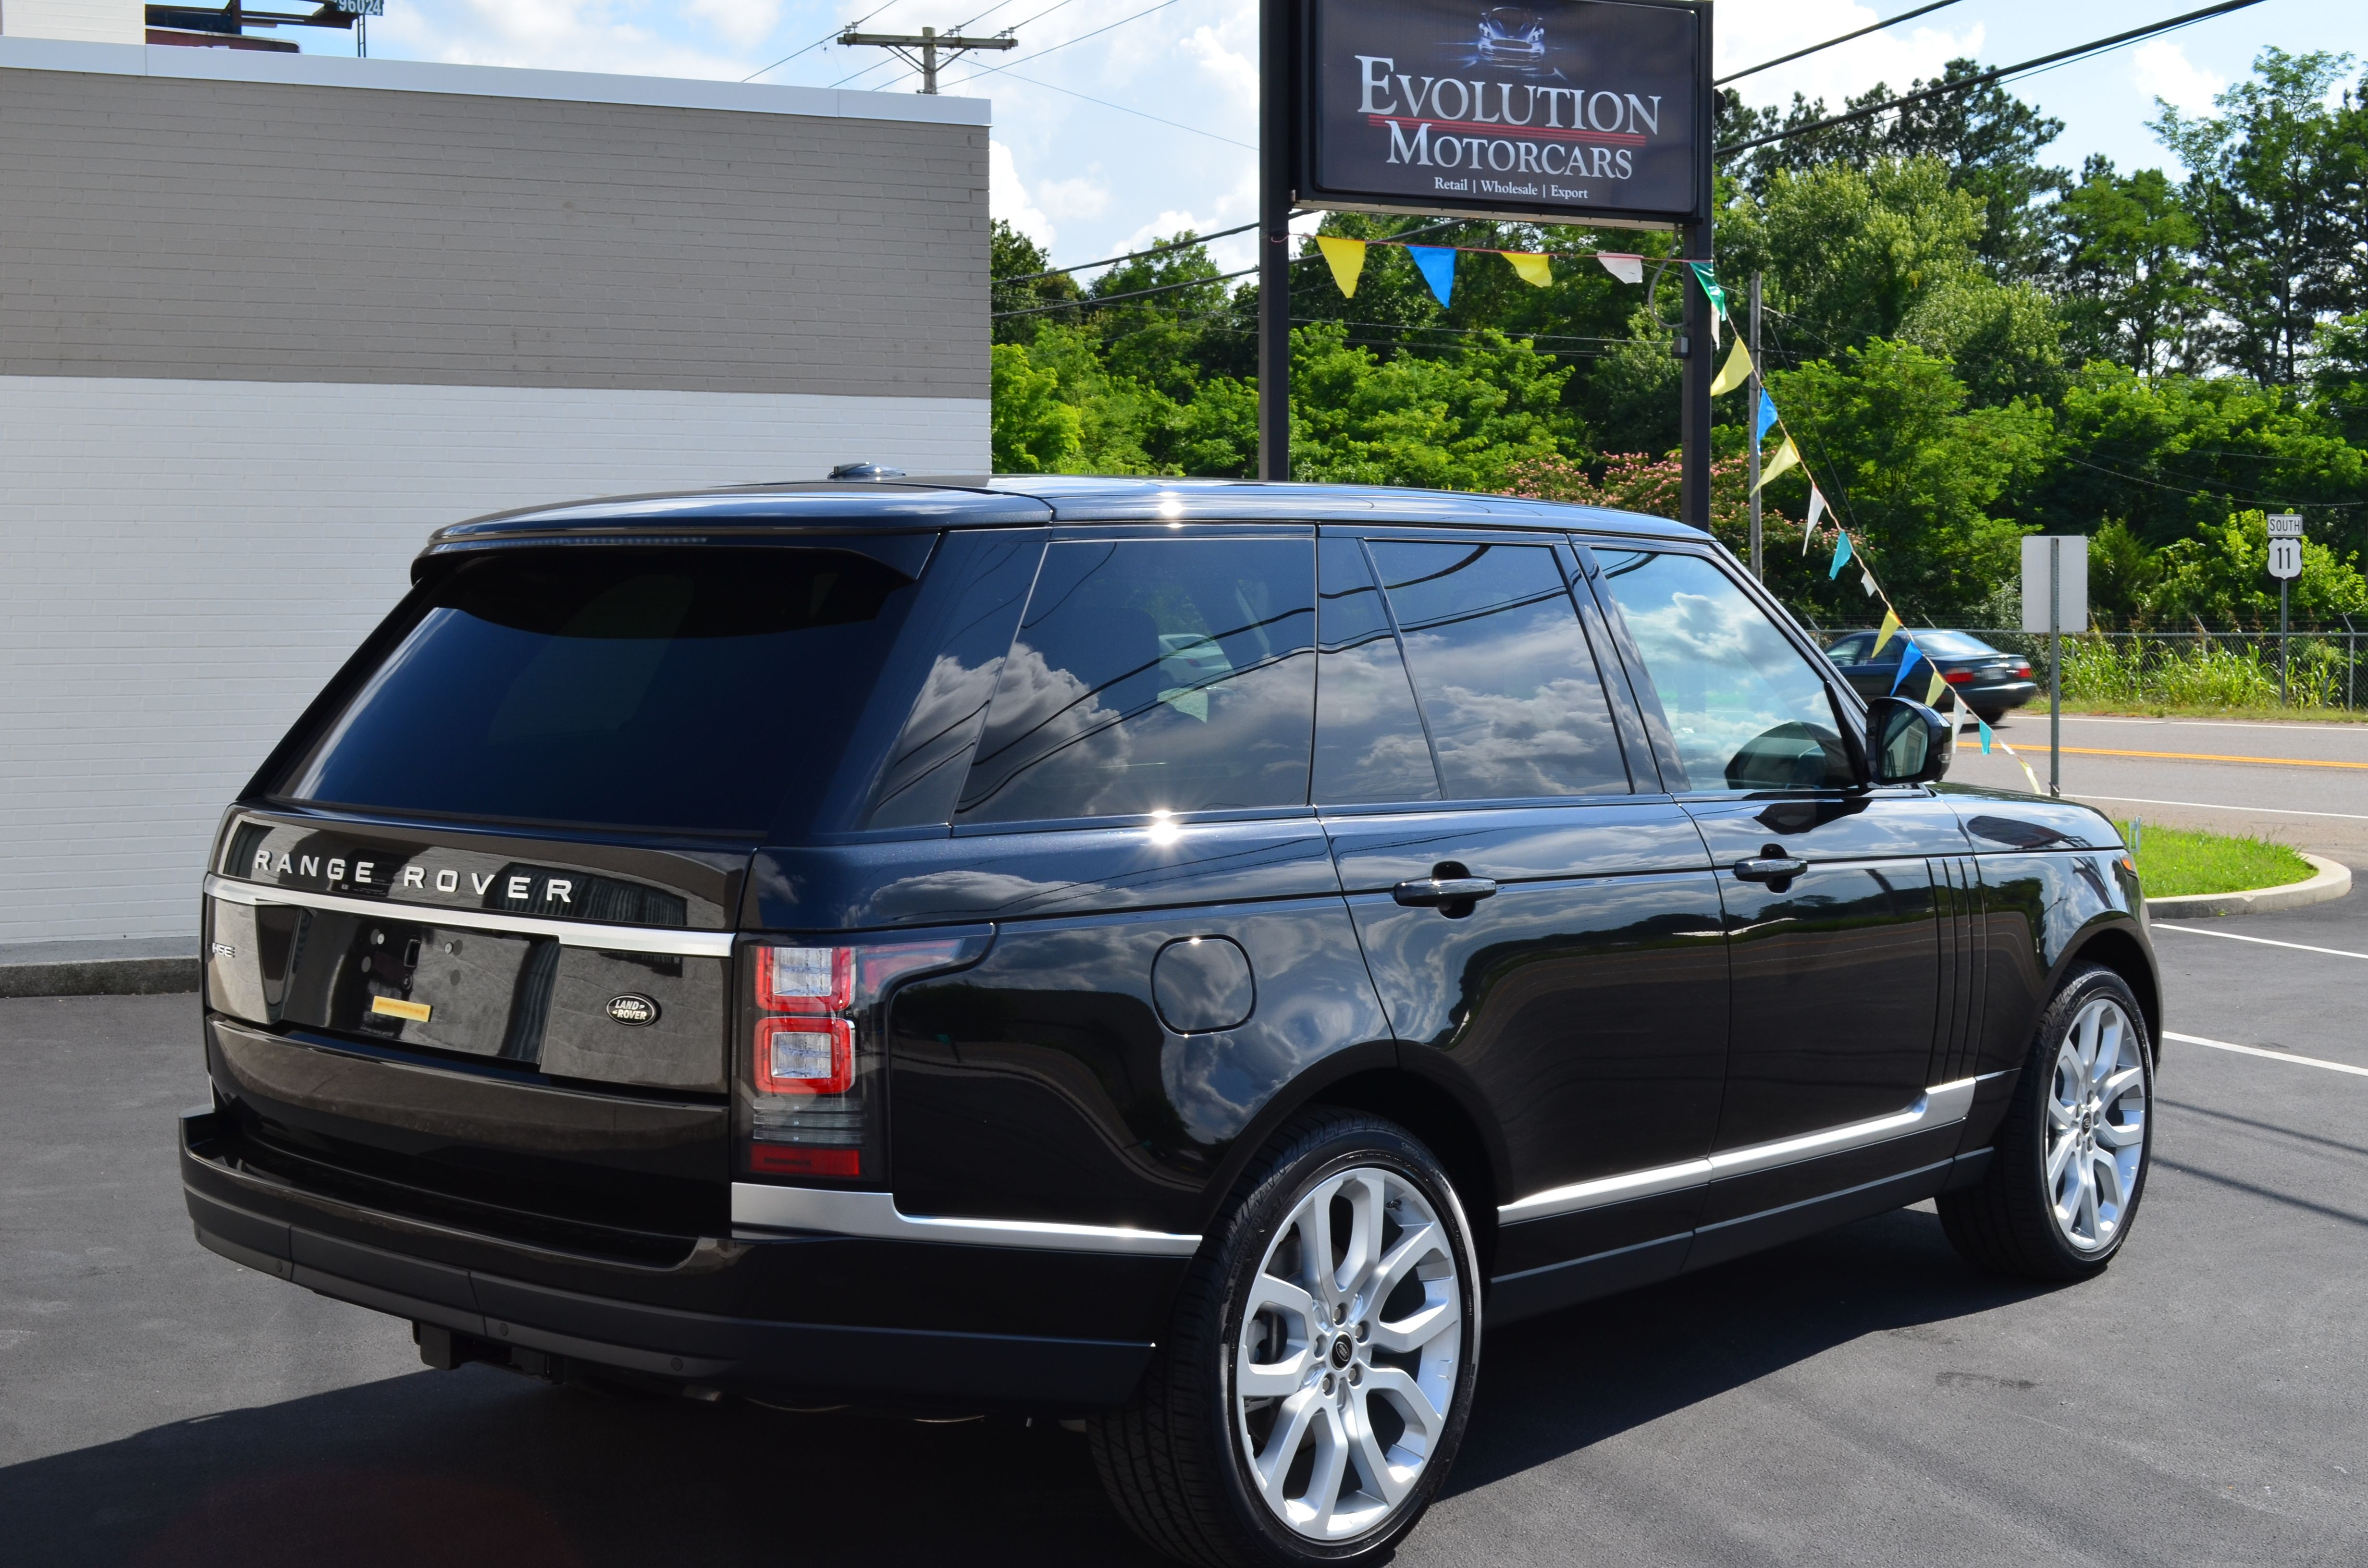 2014 Land Rover Range Rover Lenoir City Tn Us Jamesedition Land Rover Range Rover Range Rover Sport